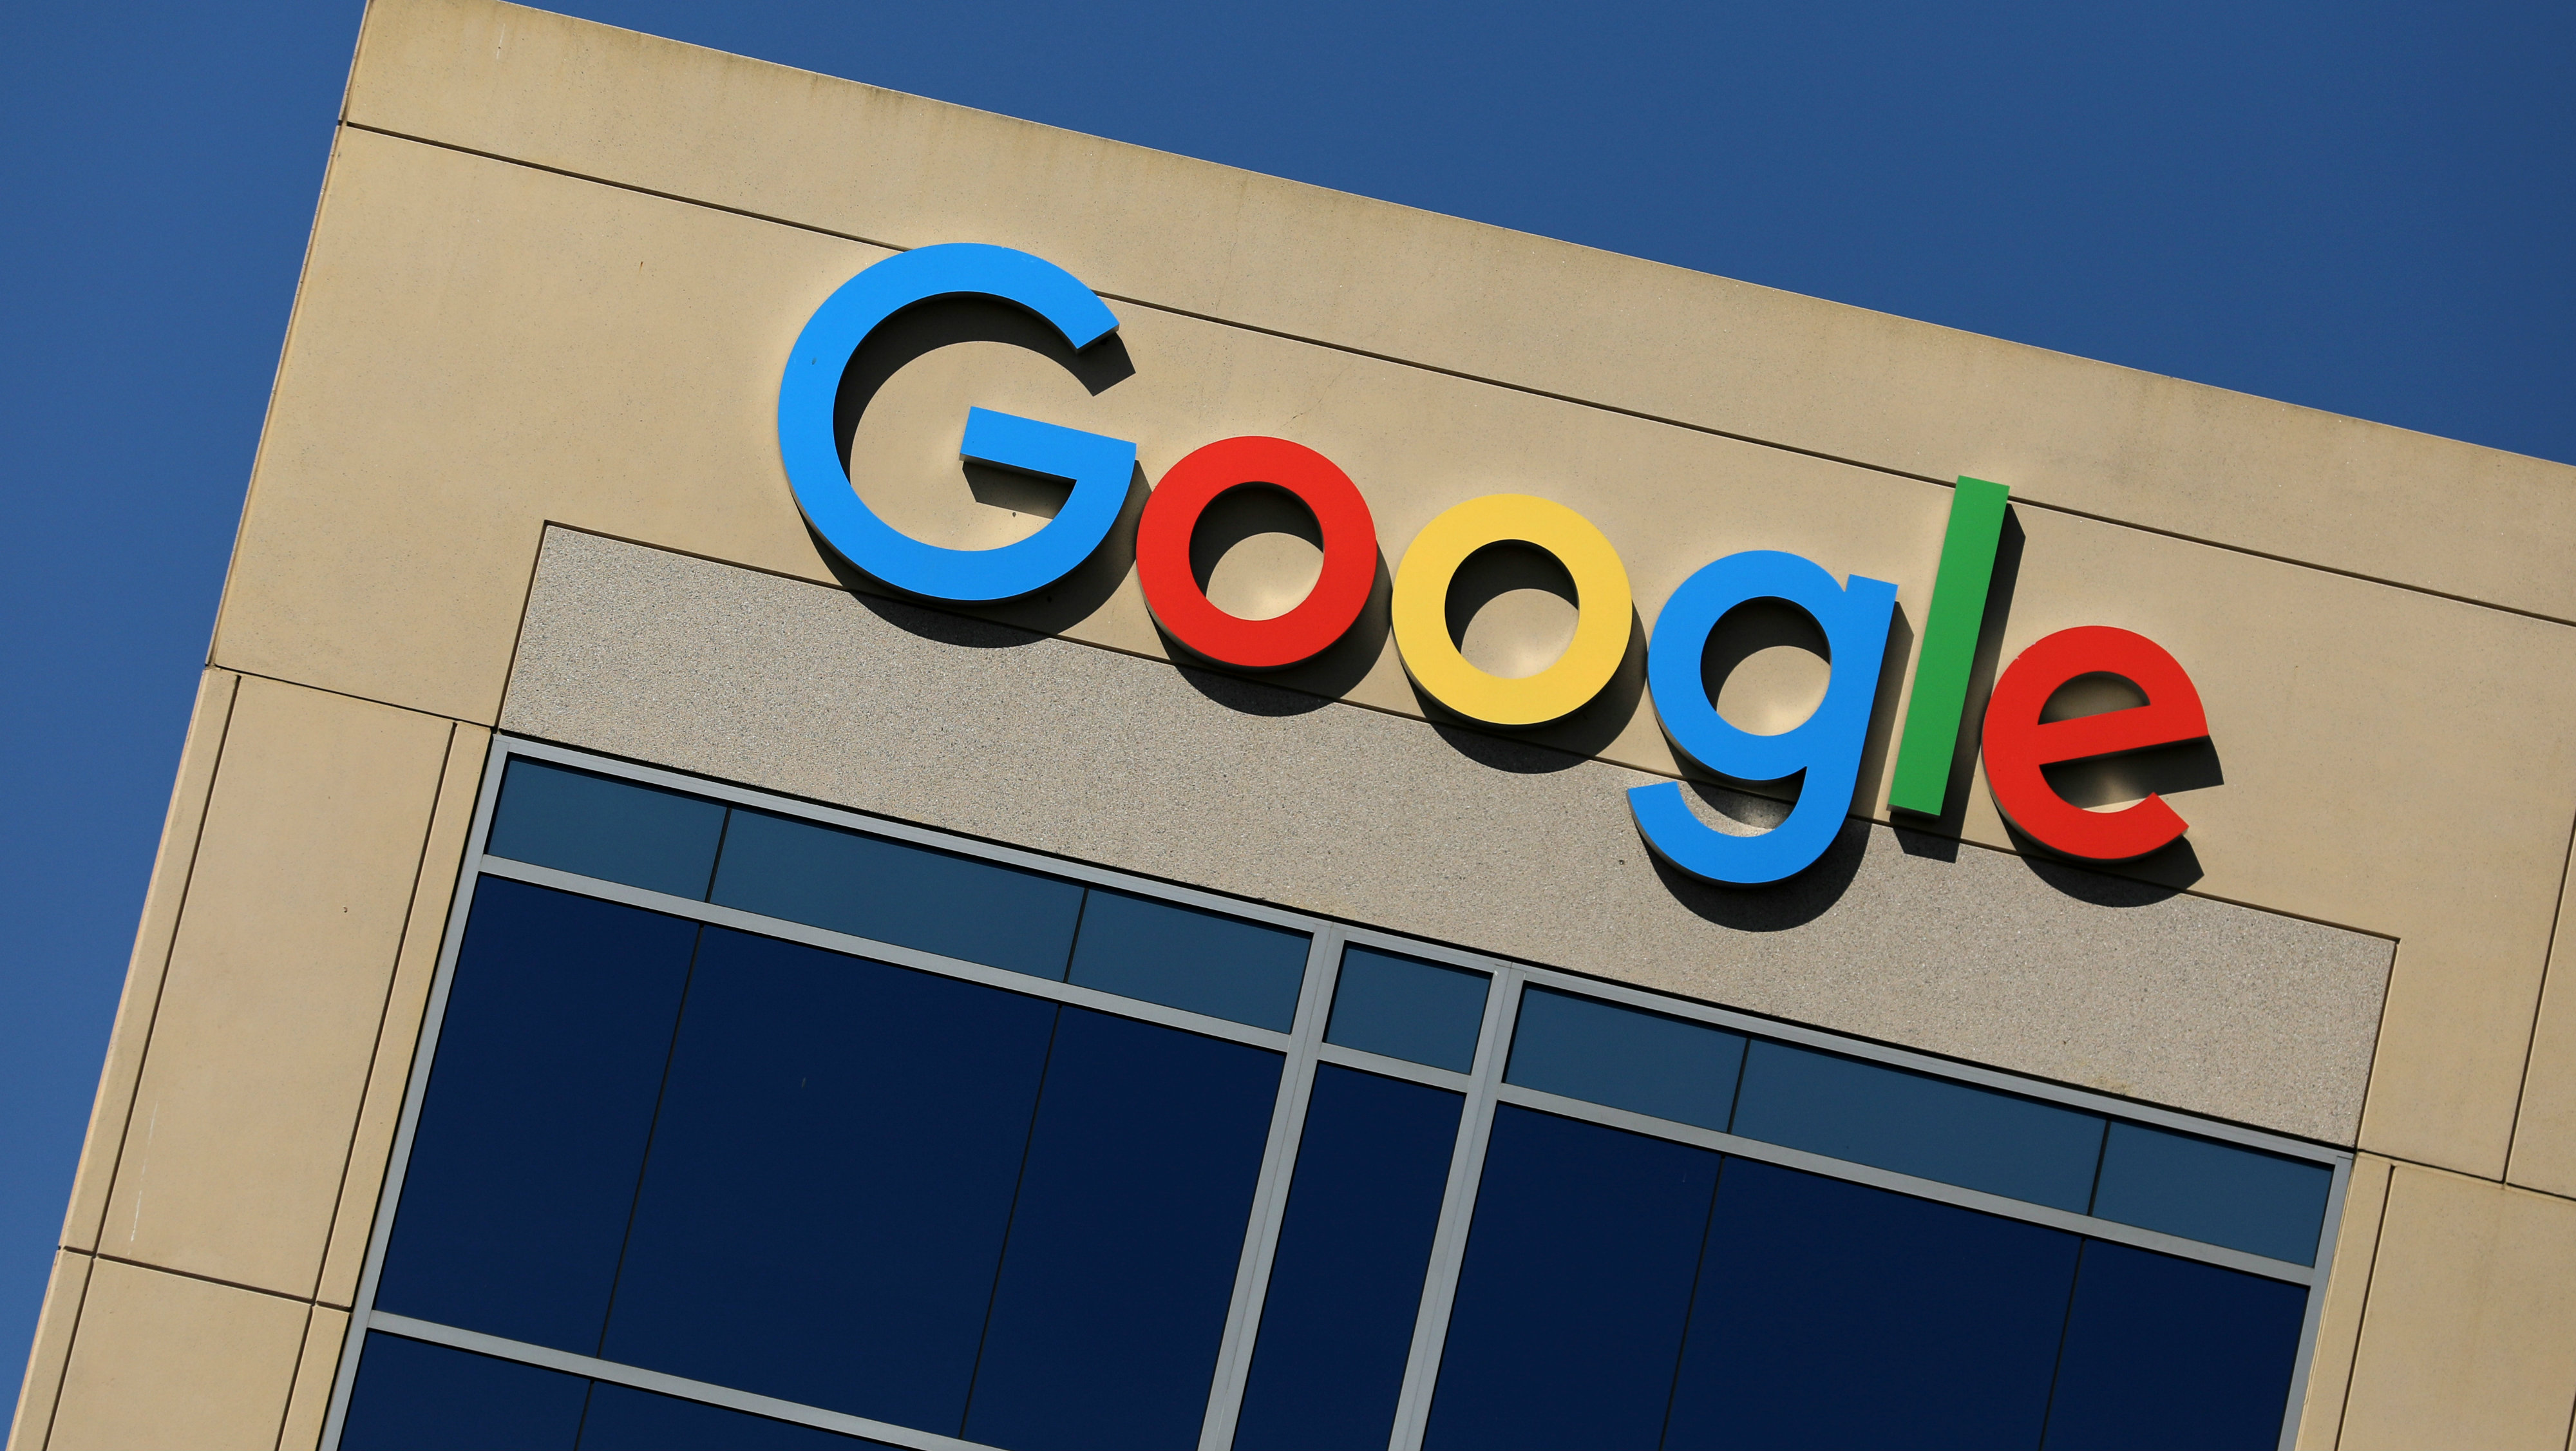 google code of ethics ai